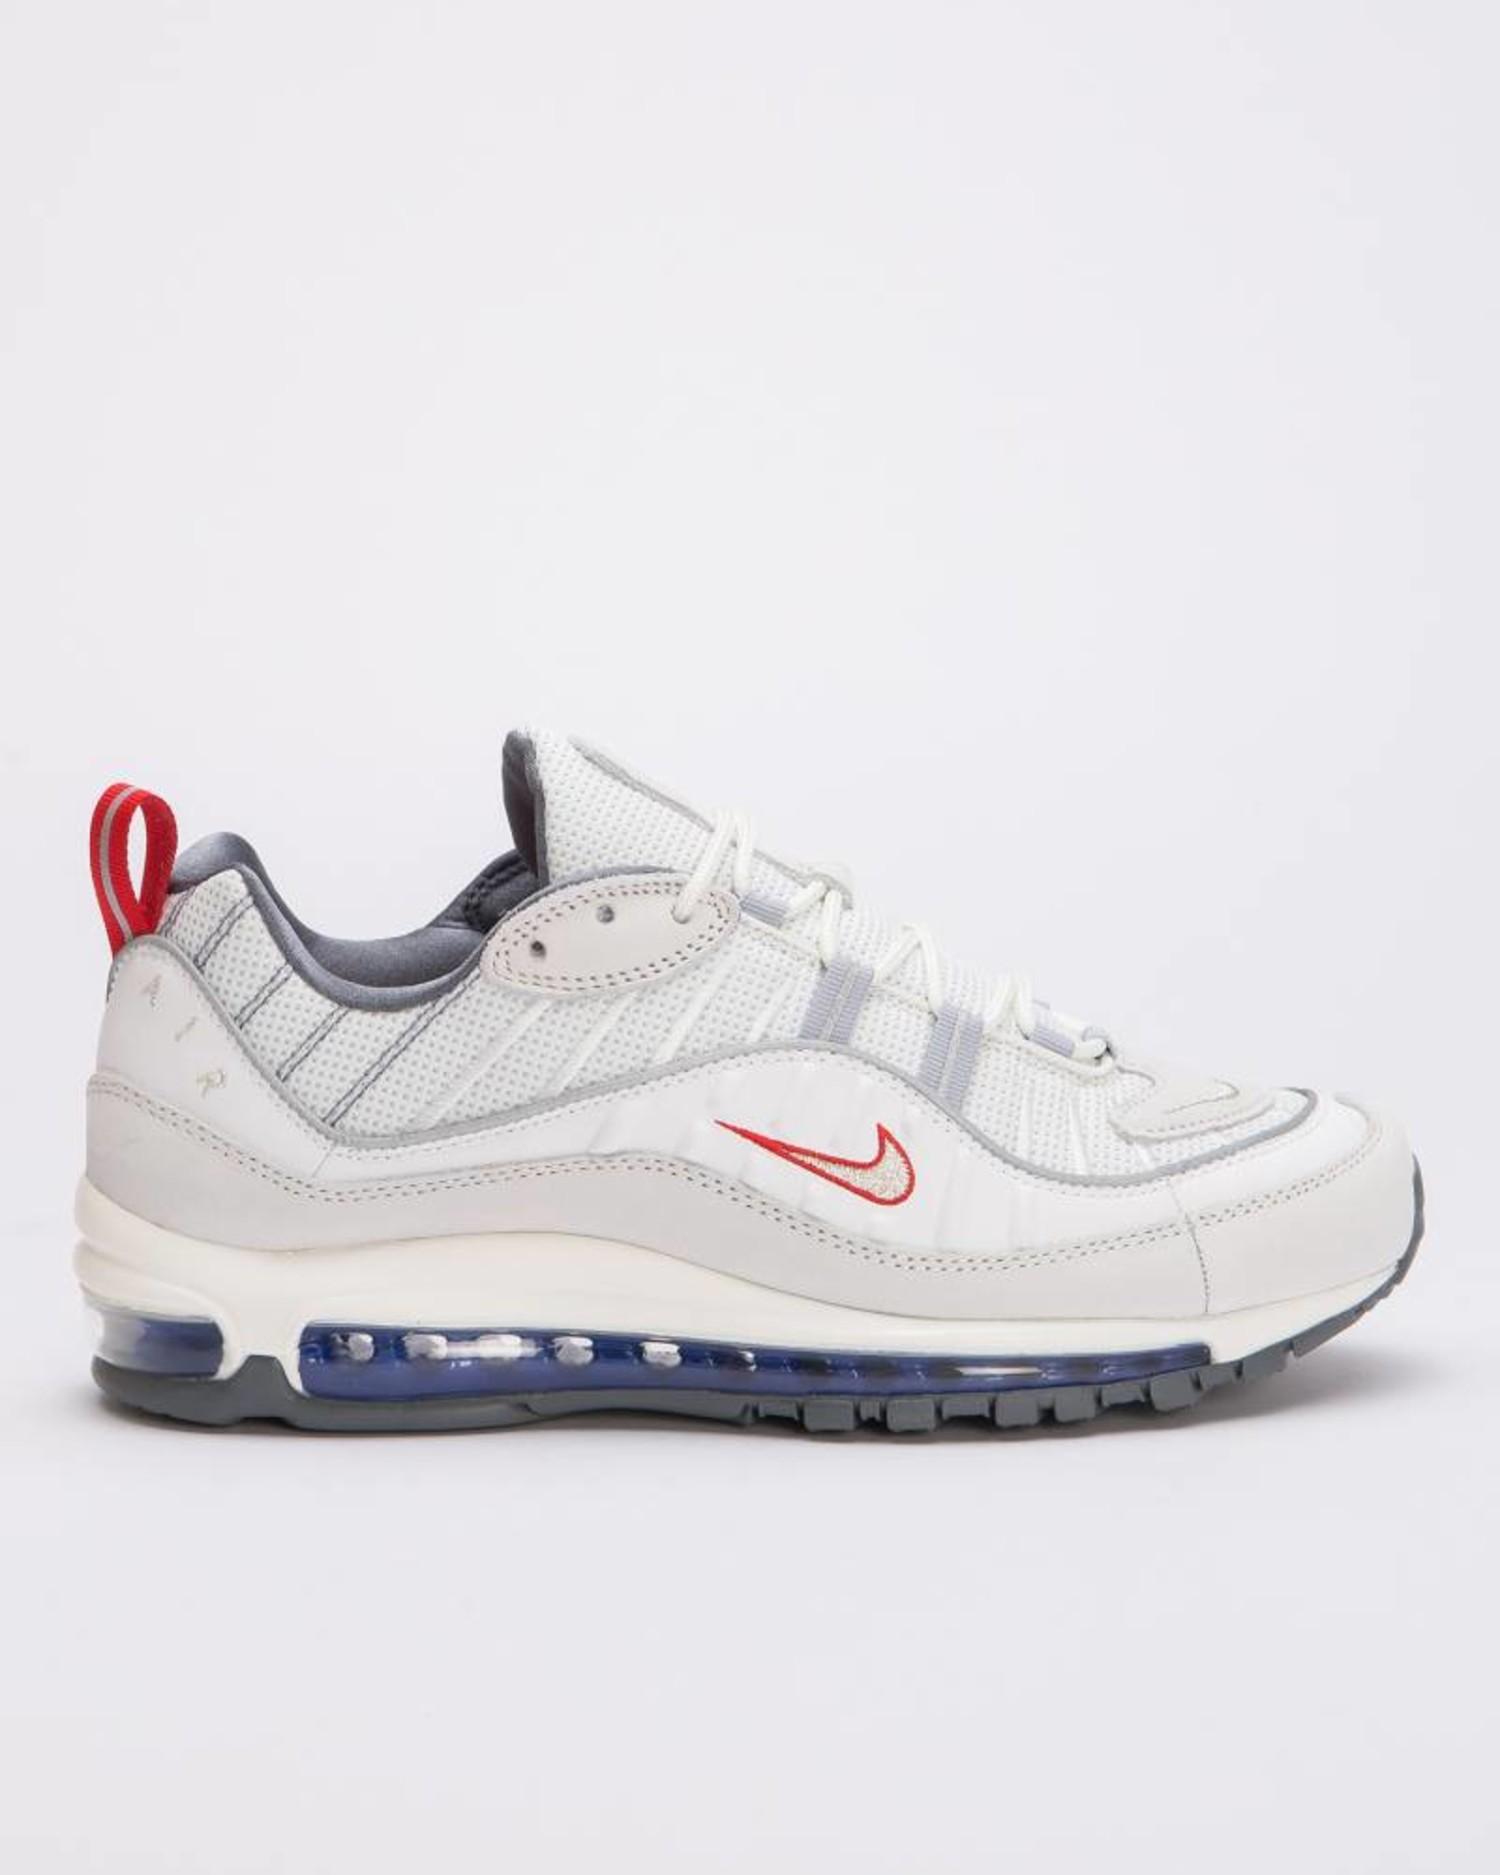 new product 5891b 14750 Nike Air Max 98 Summit white/metallic silver